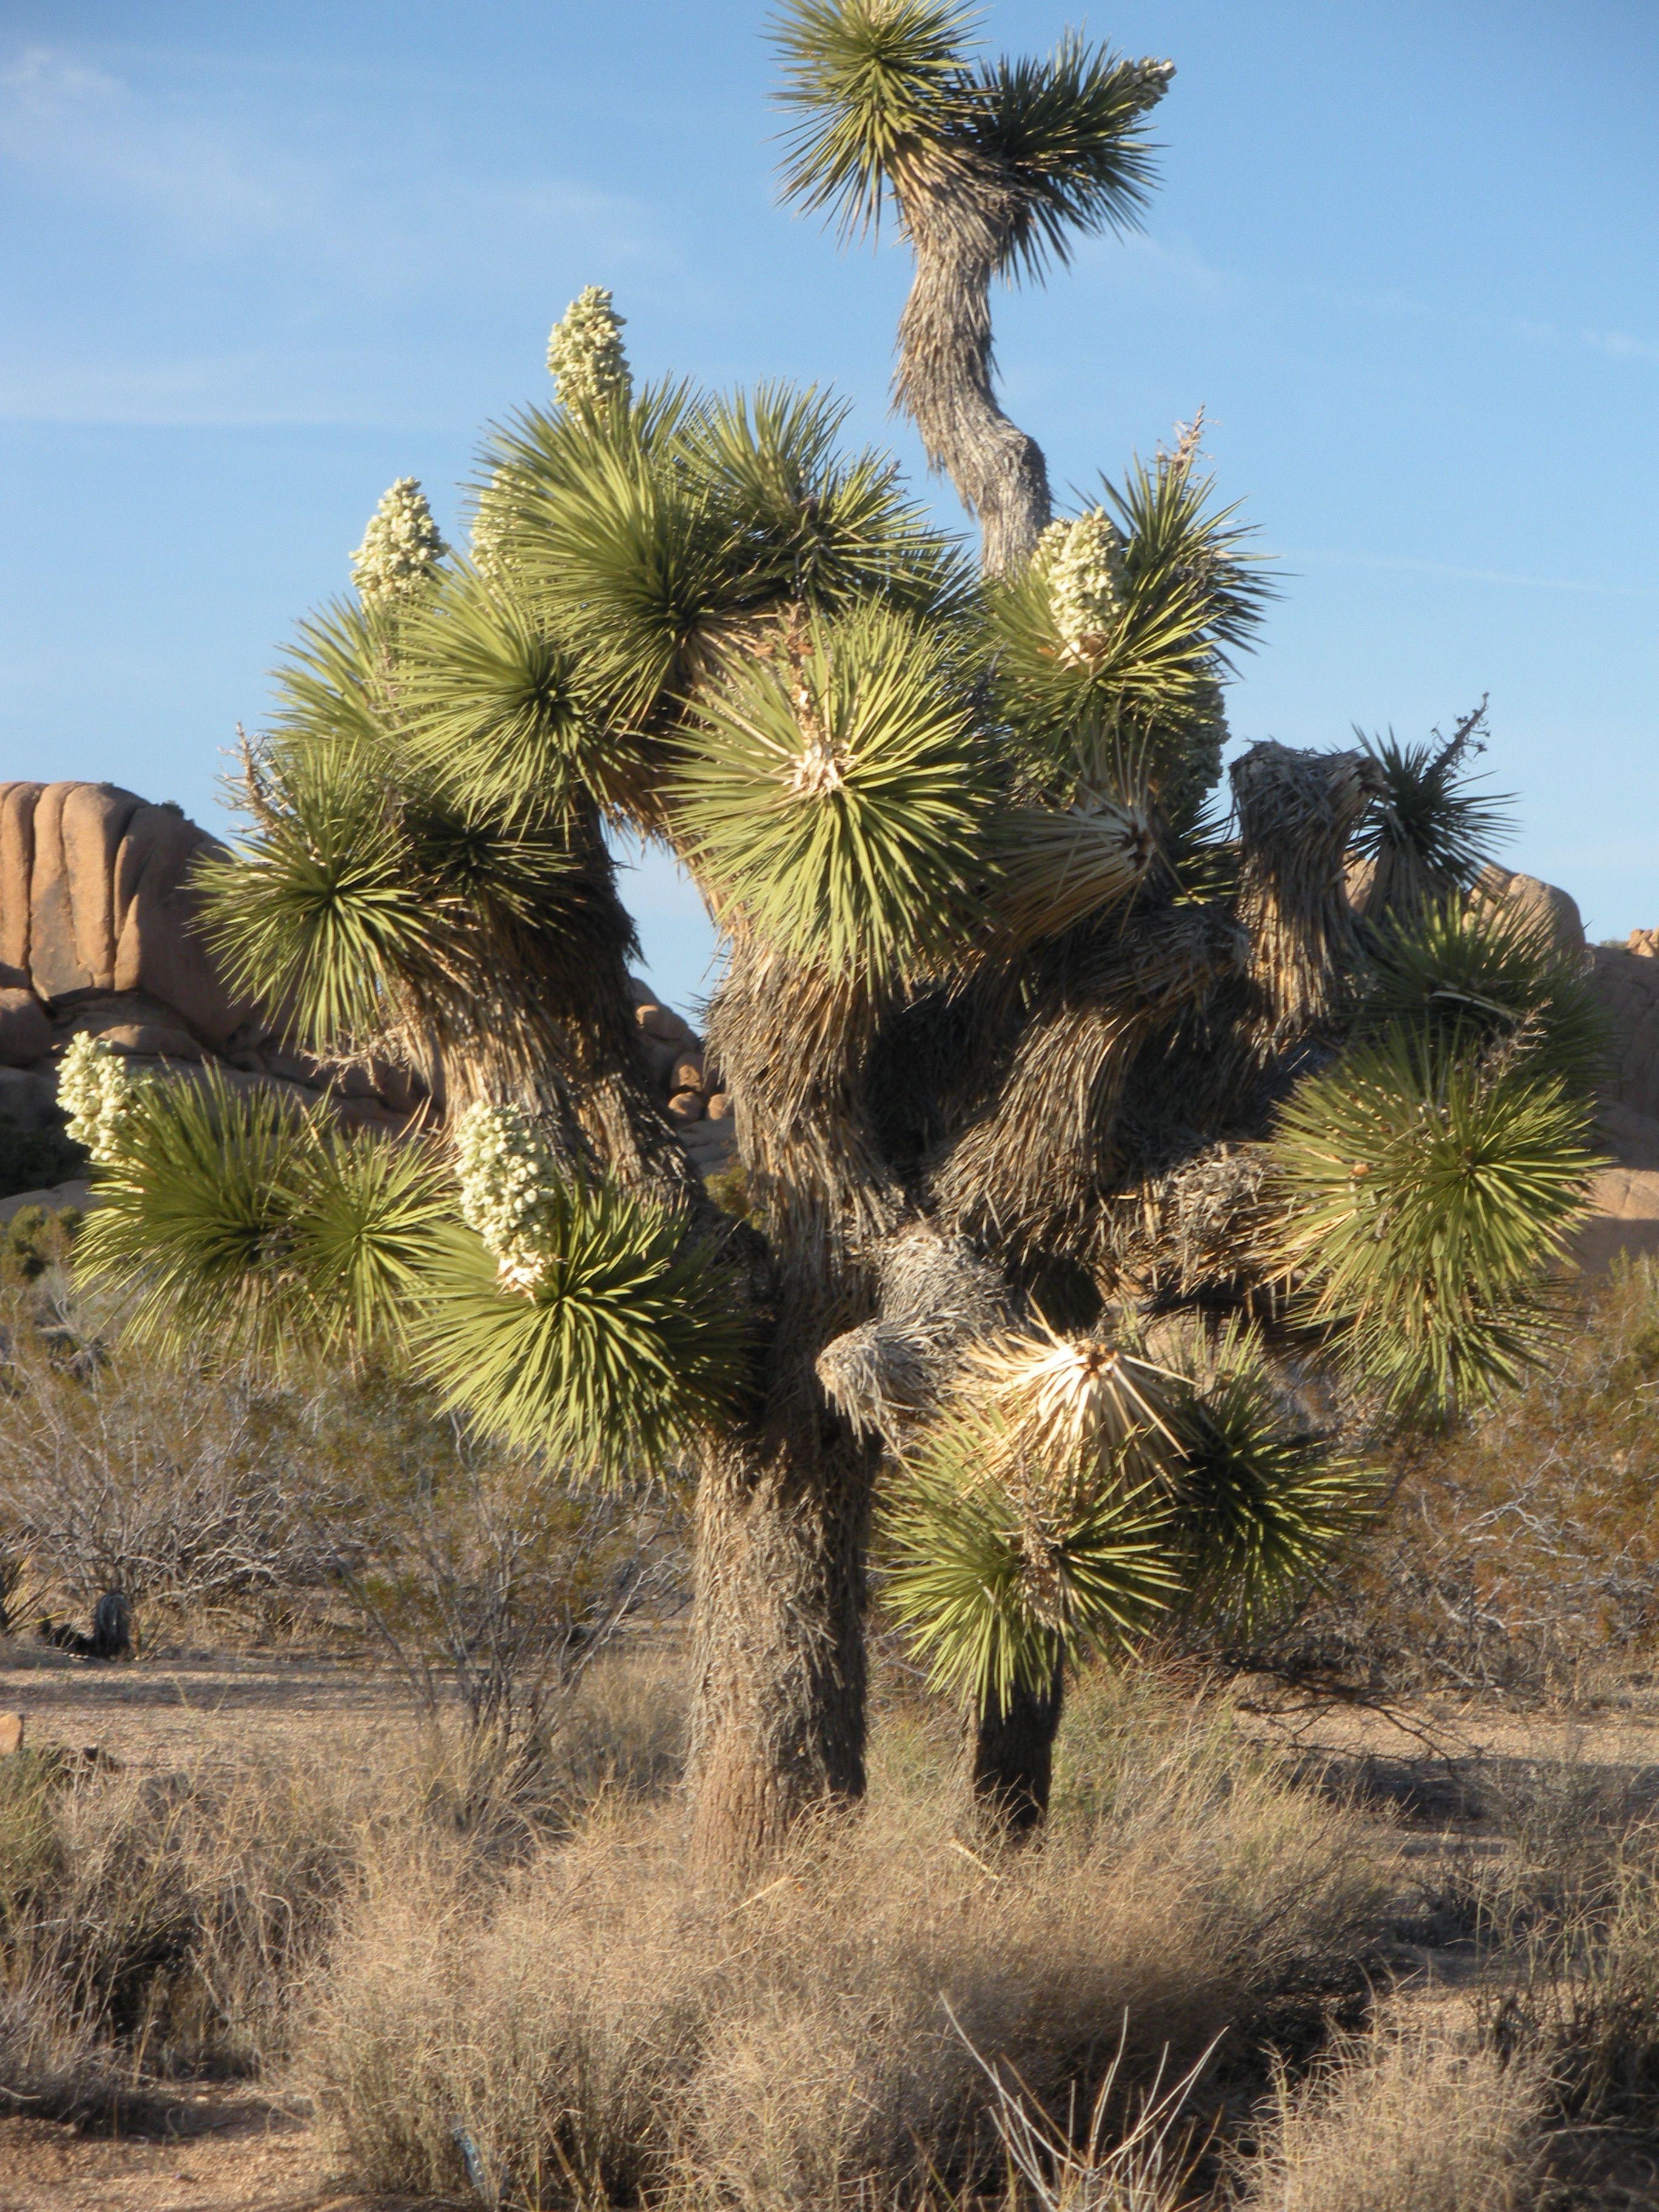 joshua tree. tree california